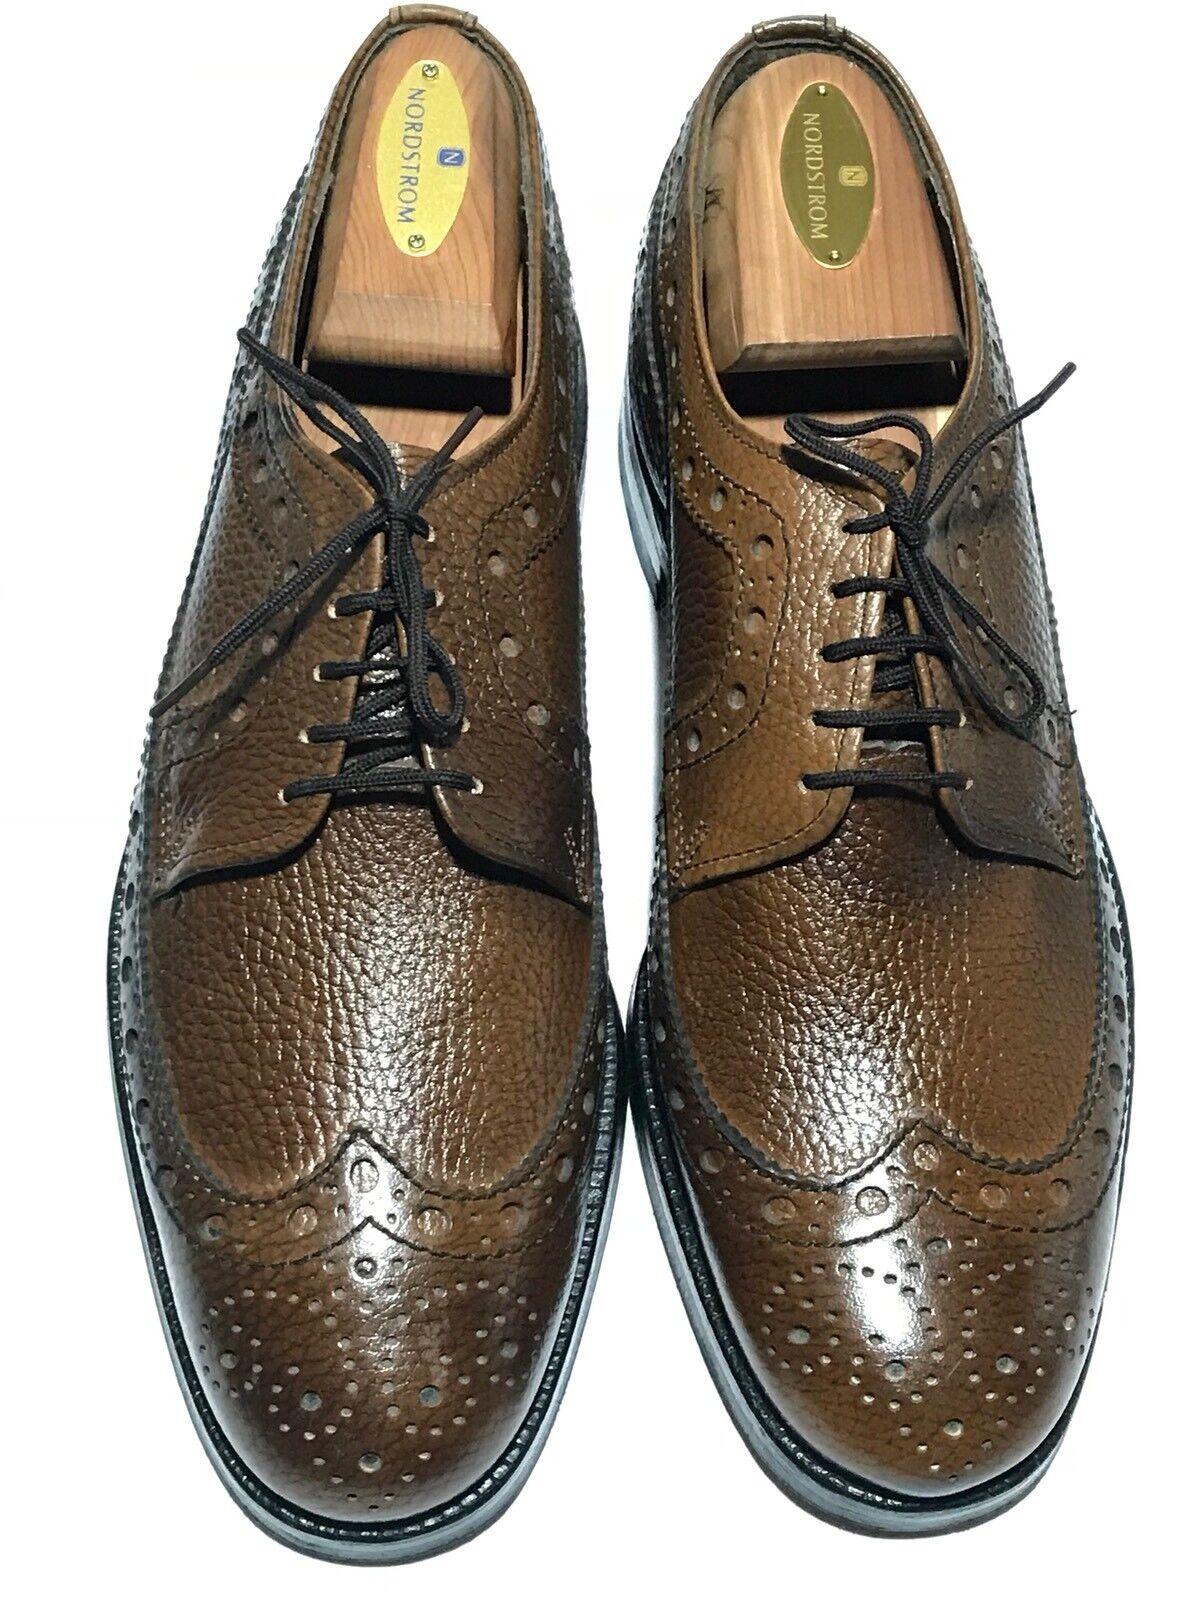 Baycrest Men's Pebble Grain Leather Brown Brogue Wingtips Size - 8 D